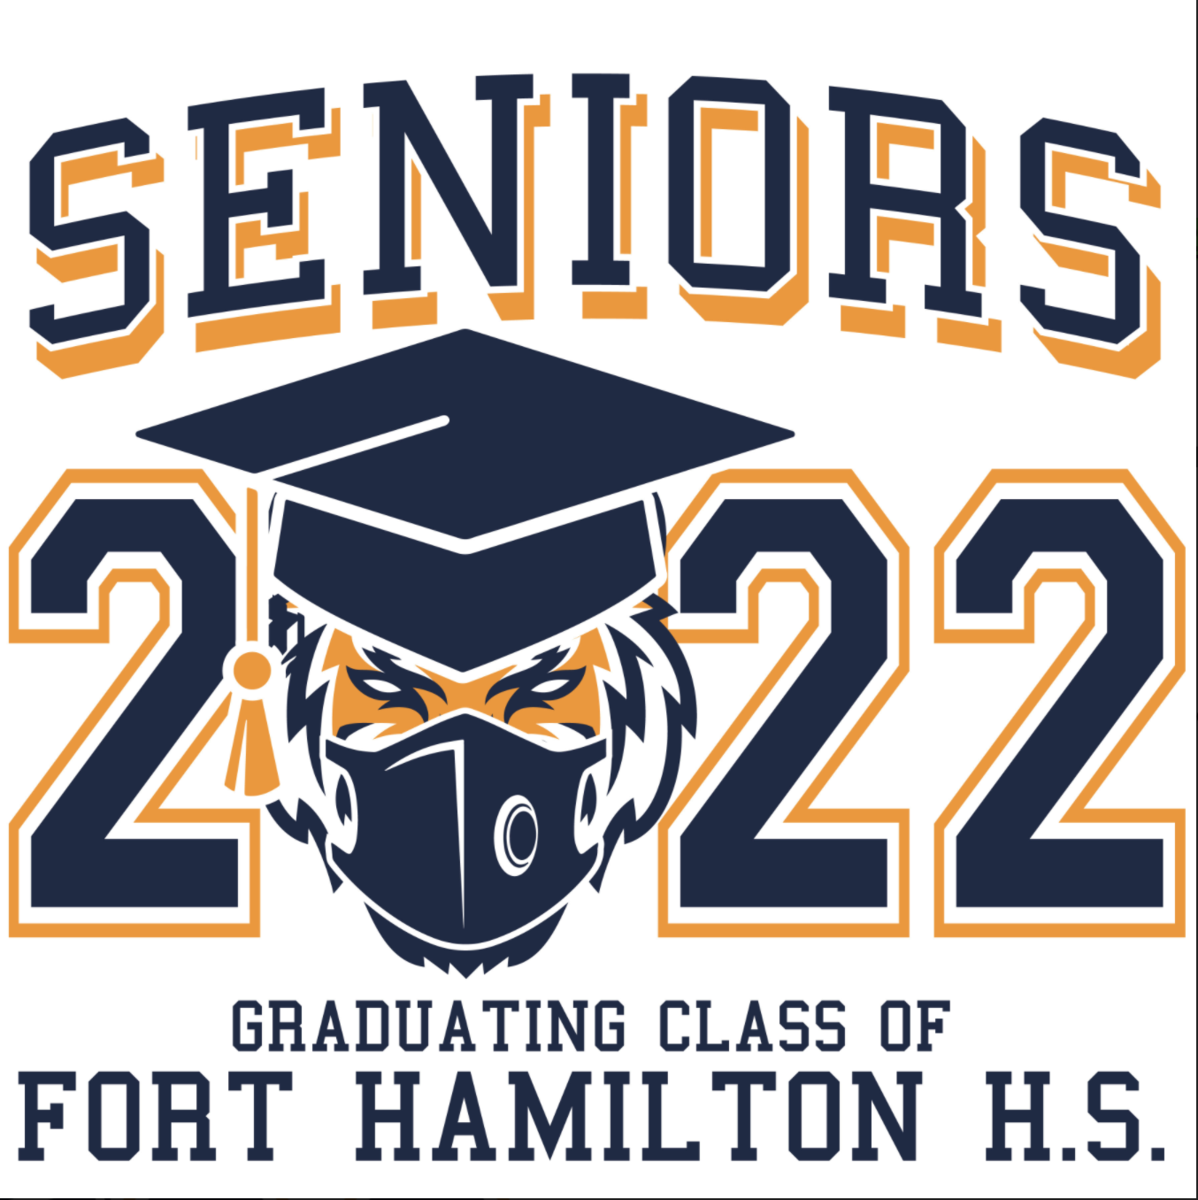 An image of the 2022 Senior class tshirt